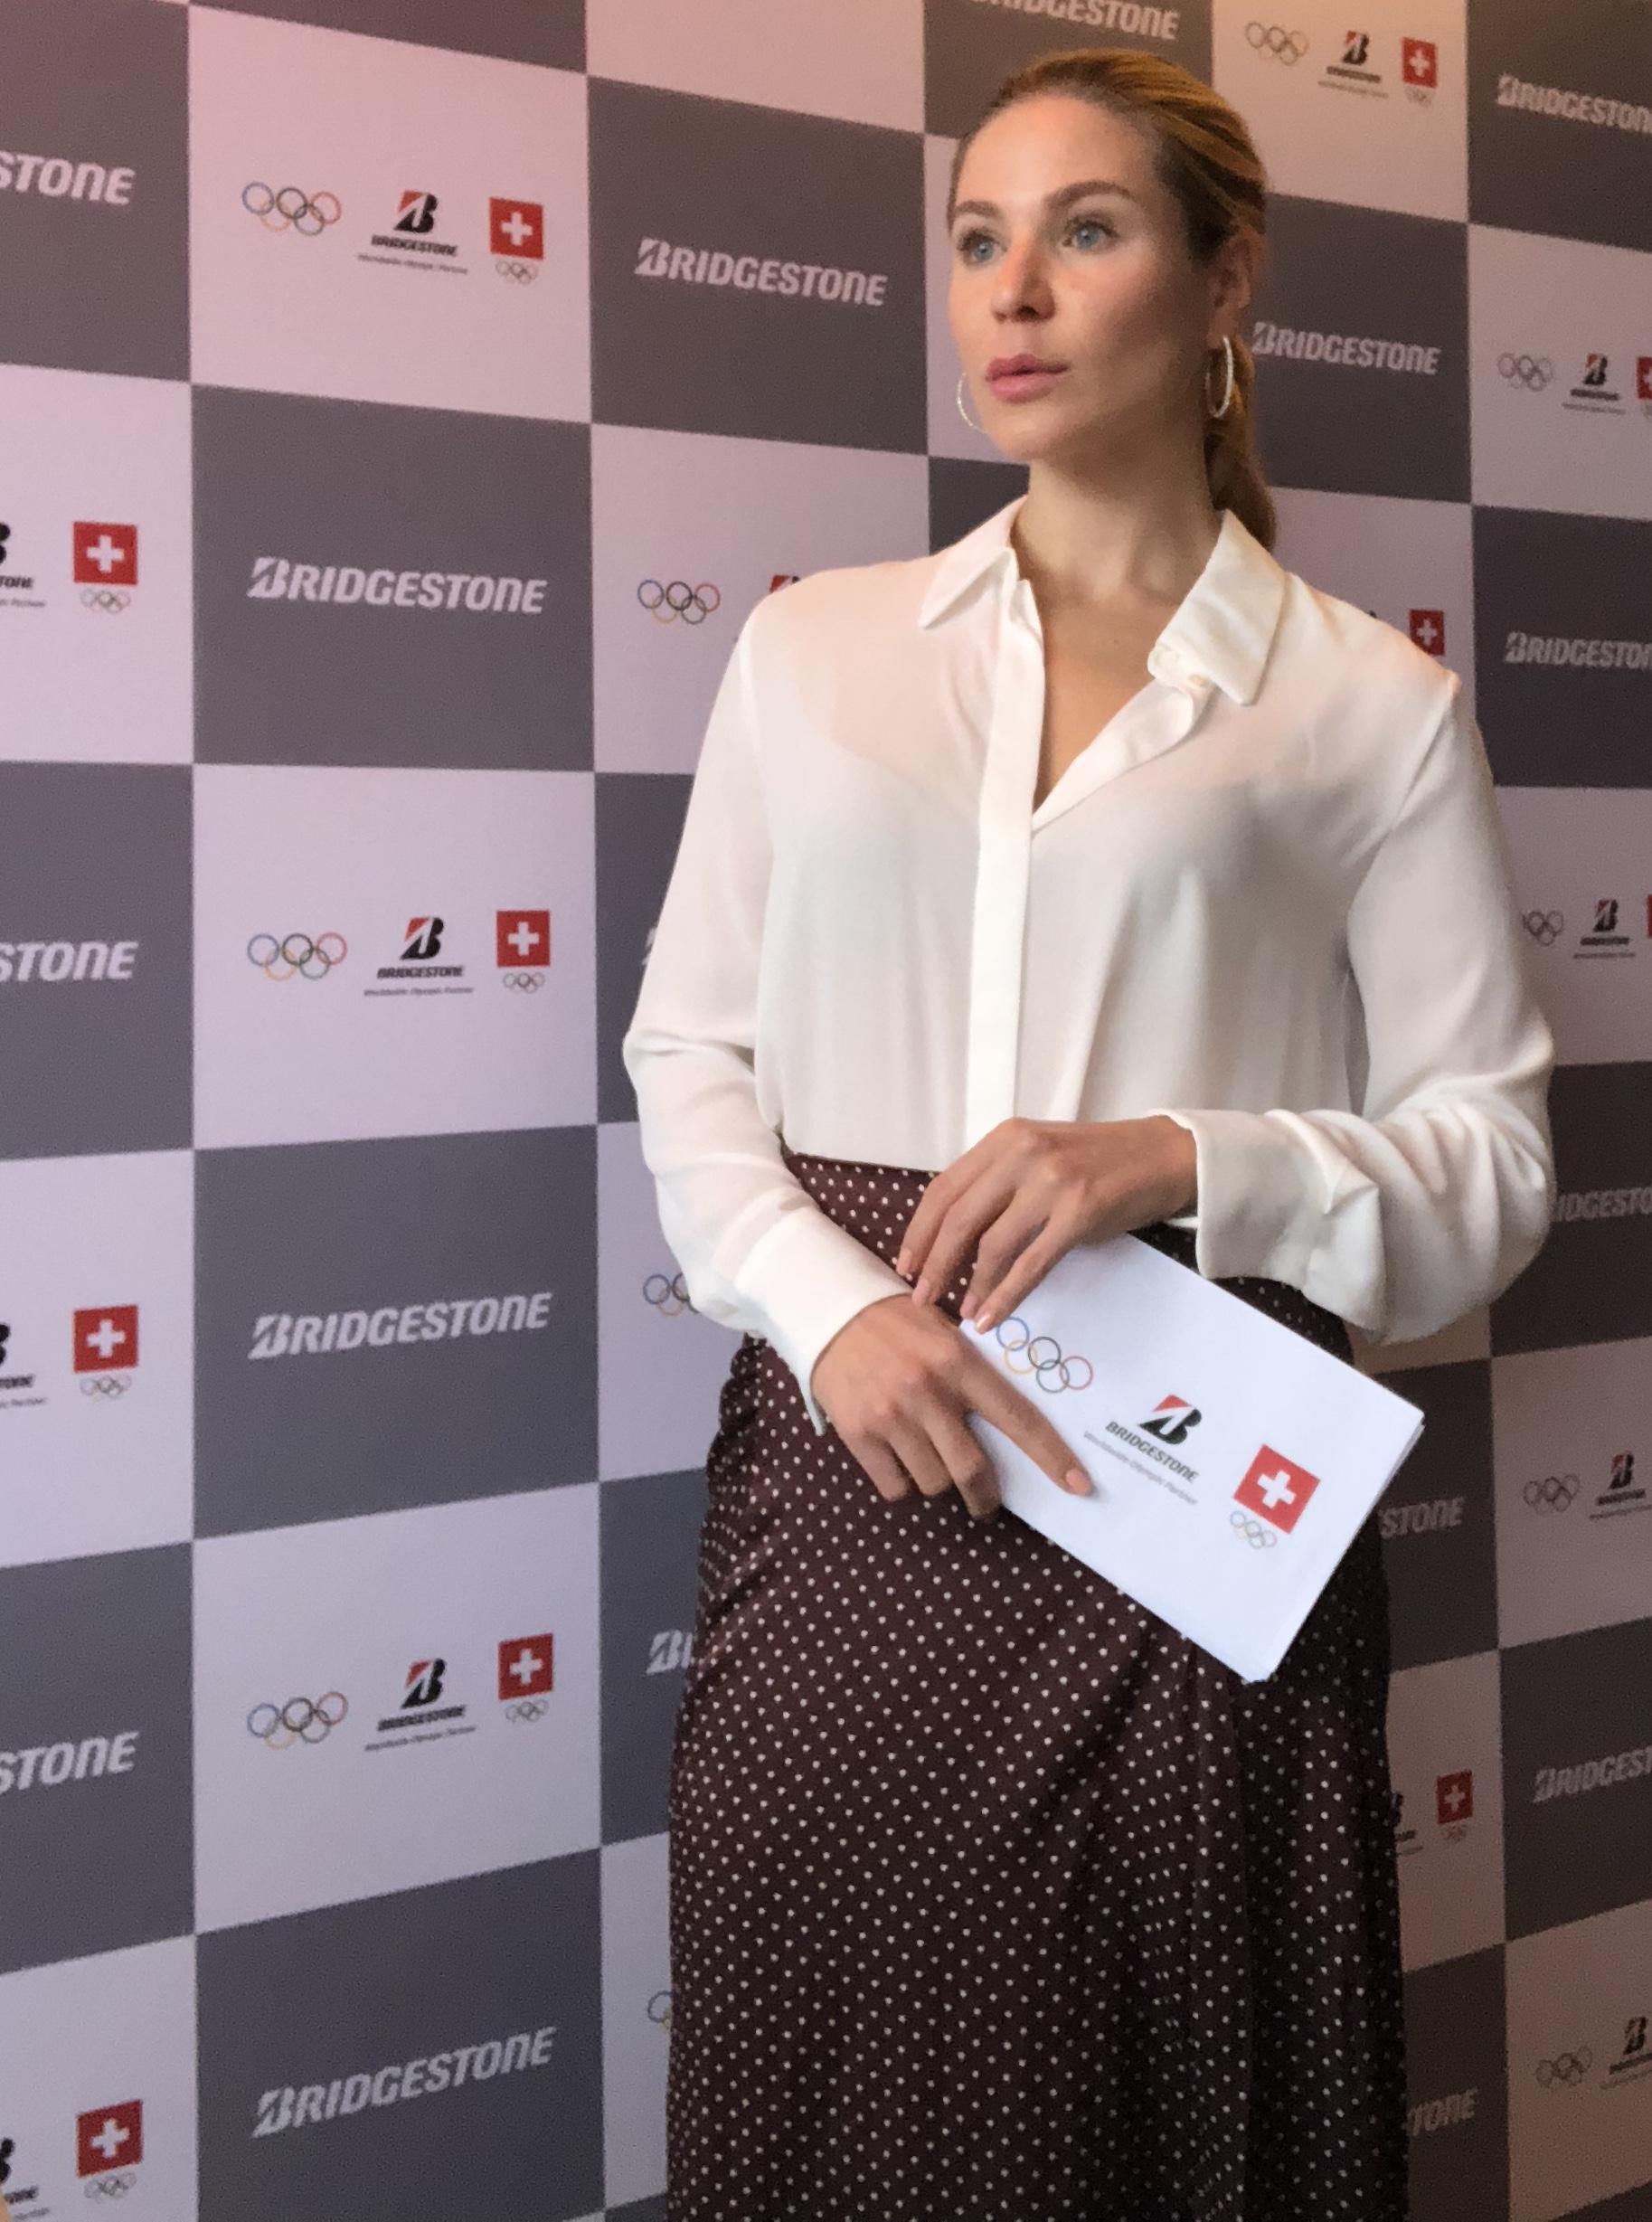 Bridgestone Pressekonferenz